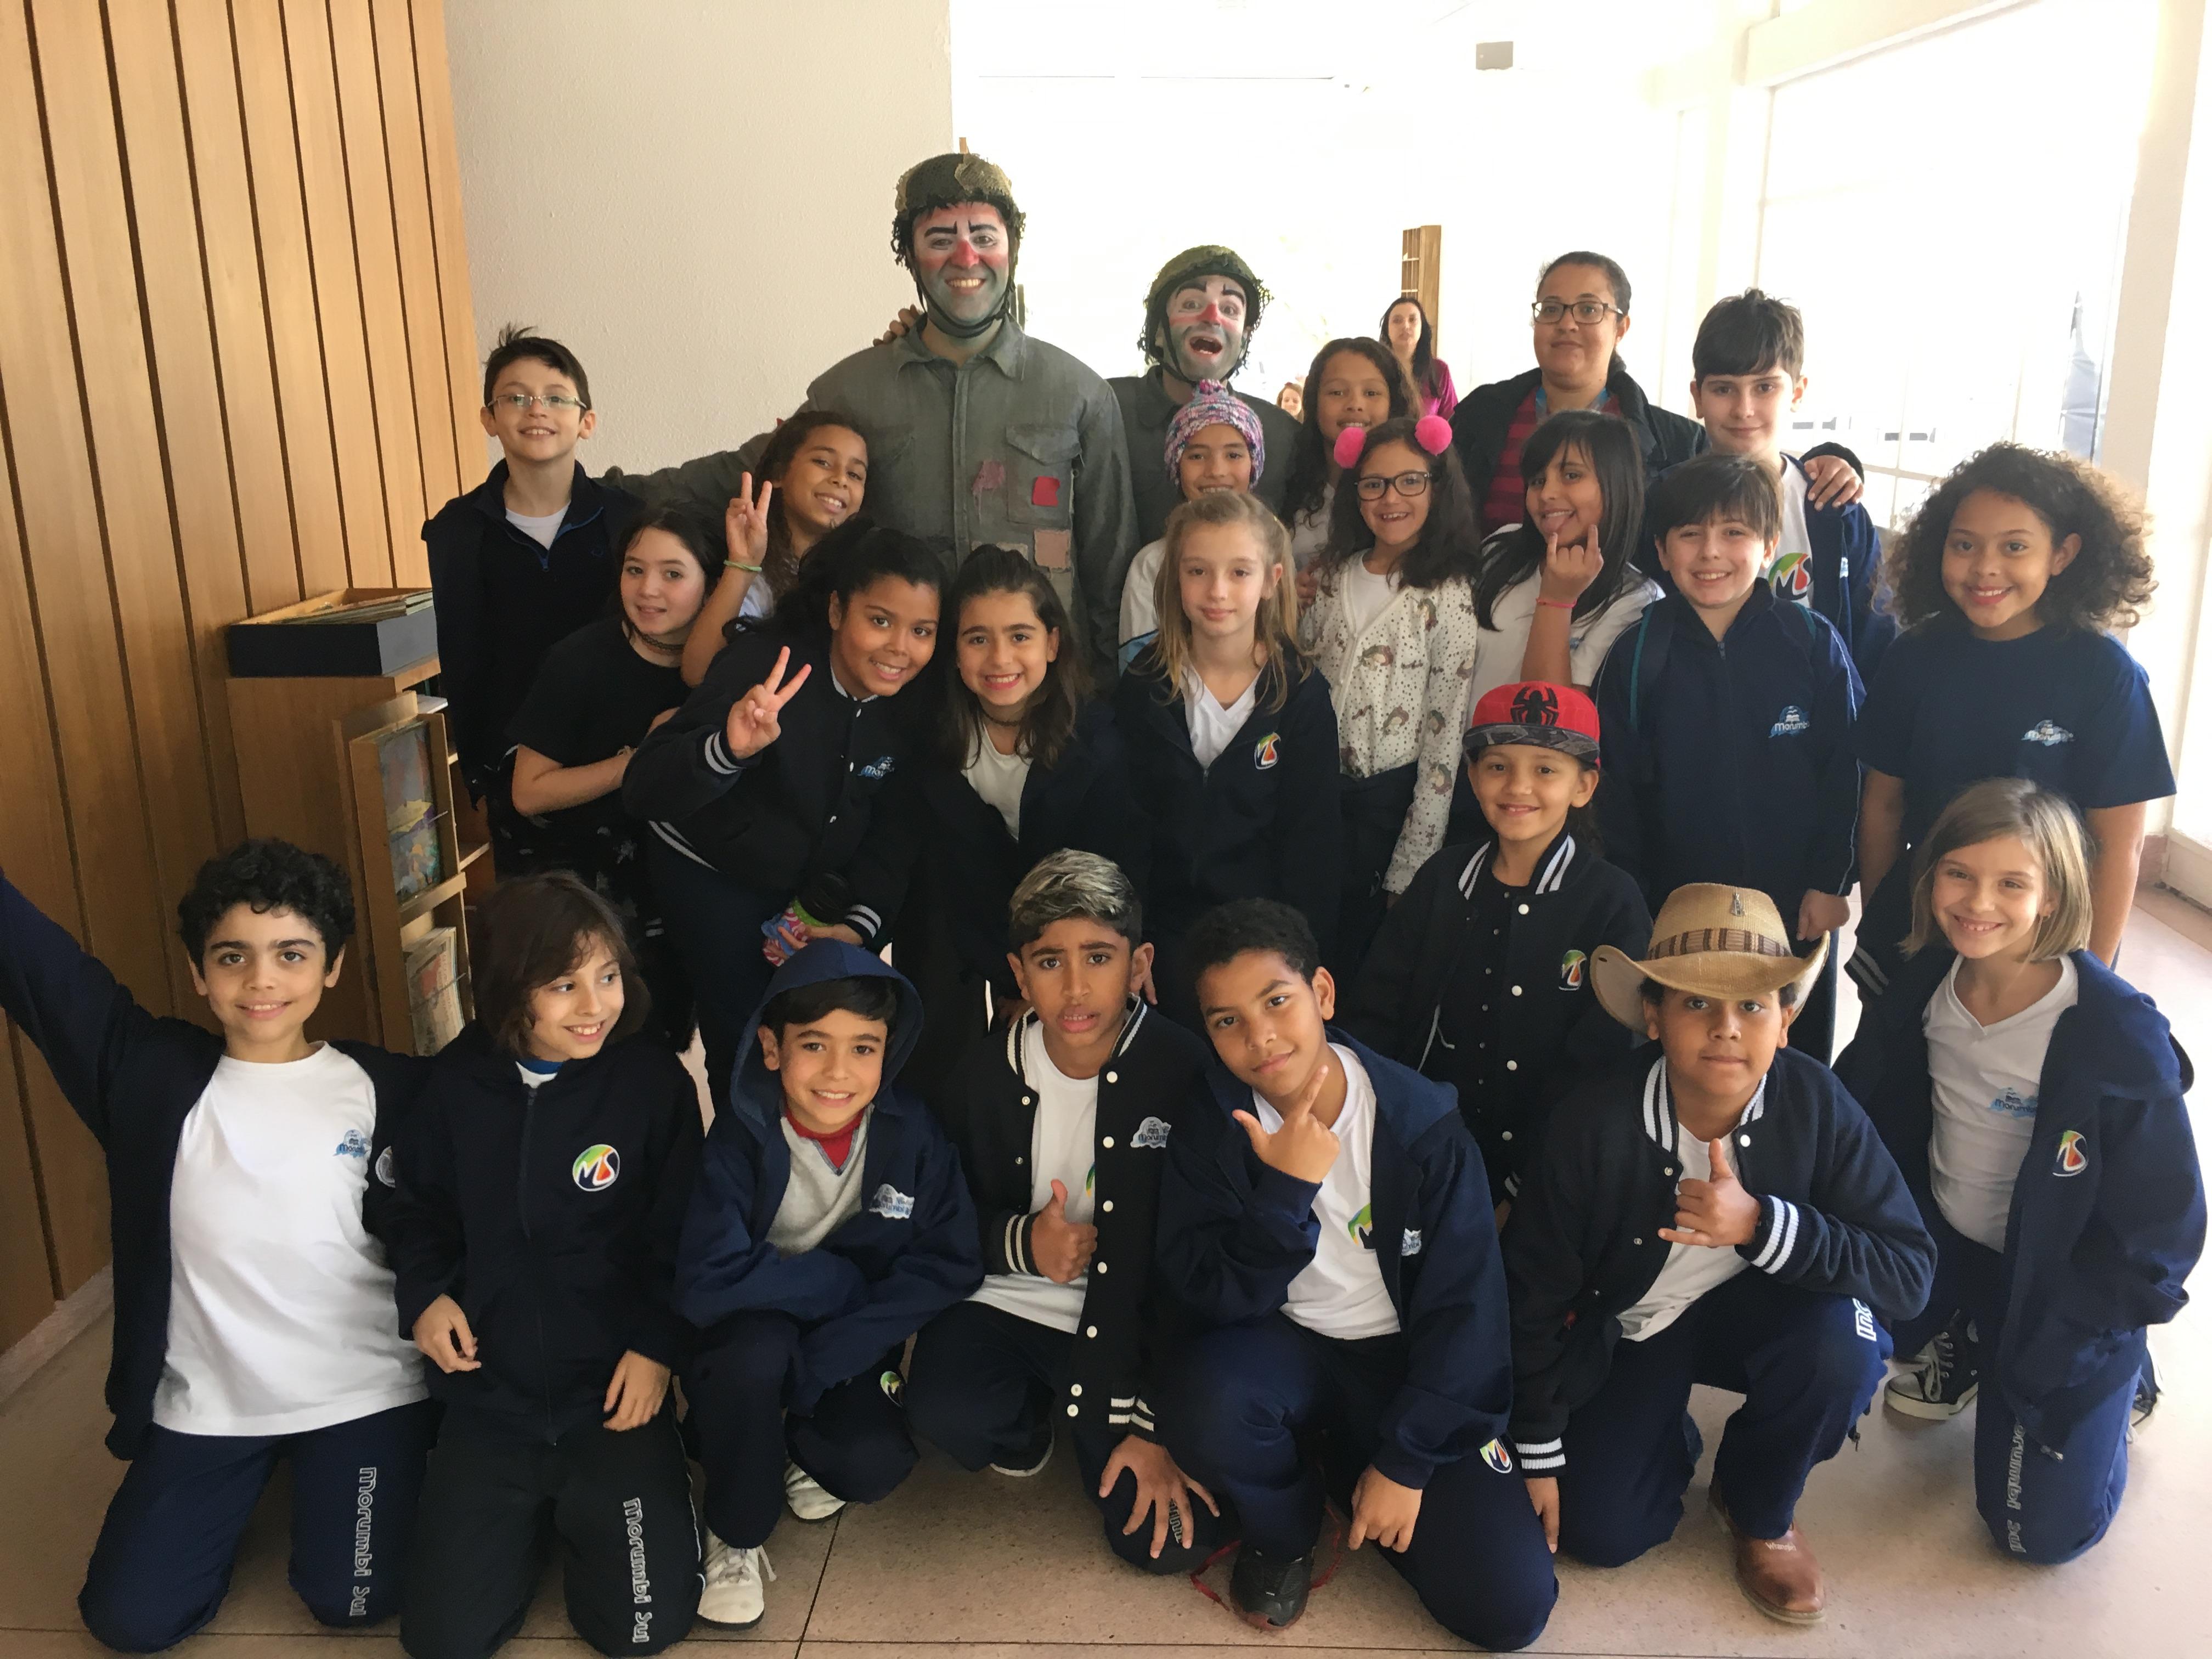 Alunos do Colégio Morumbi Sul assistindo O Inimigo - Teatro Paulo Eiró - Ago/2018